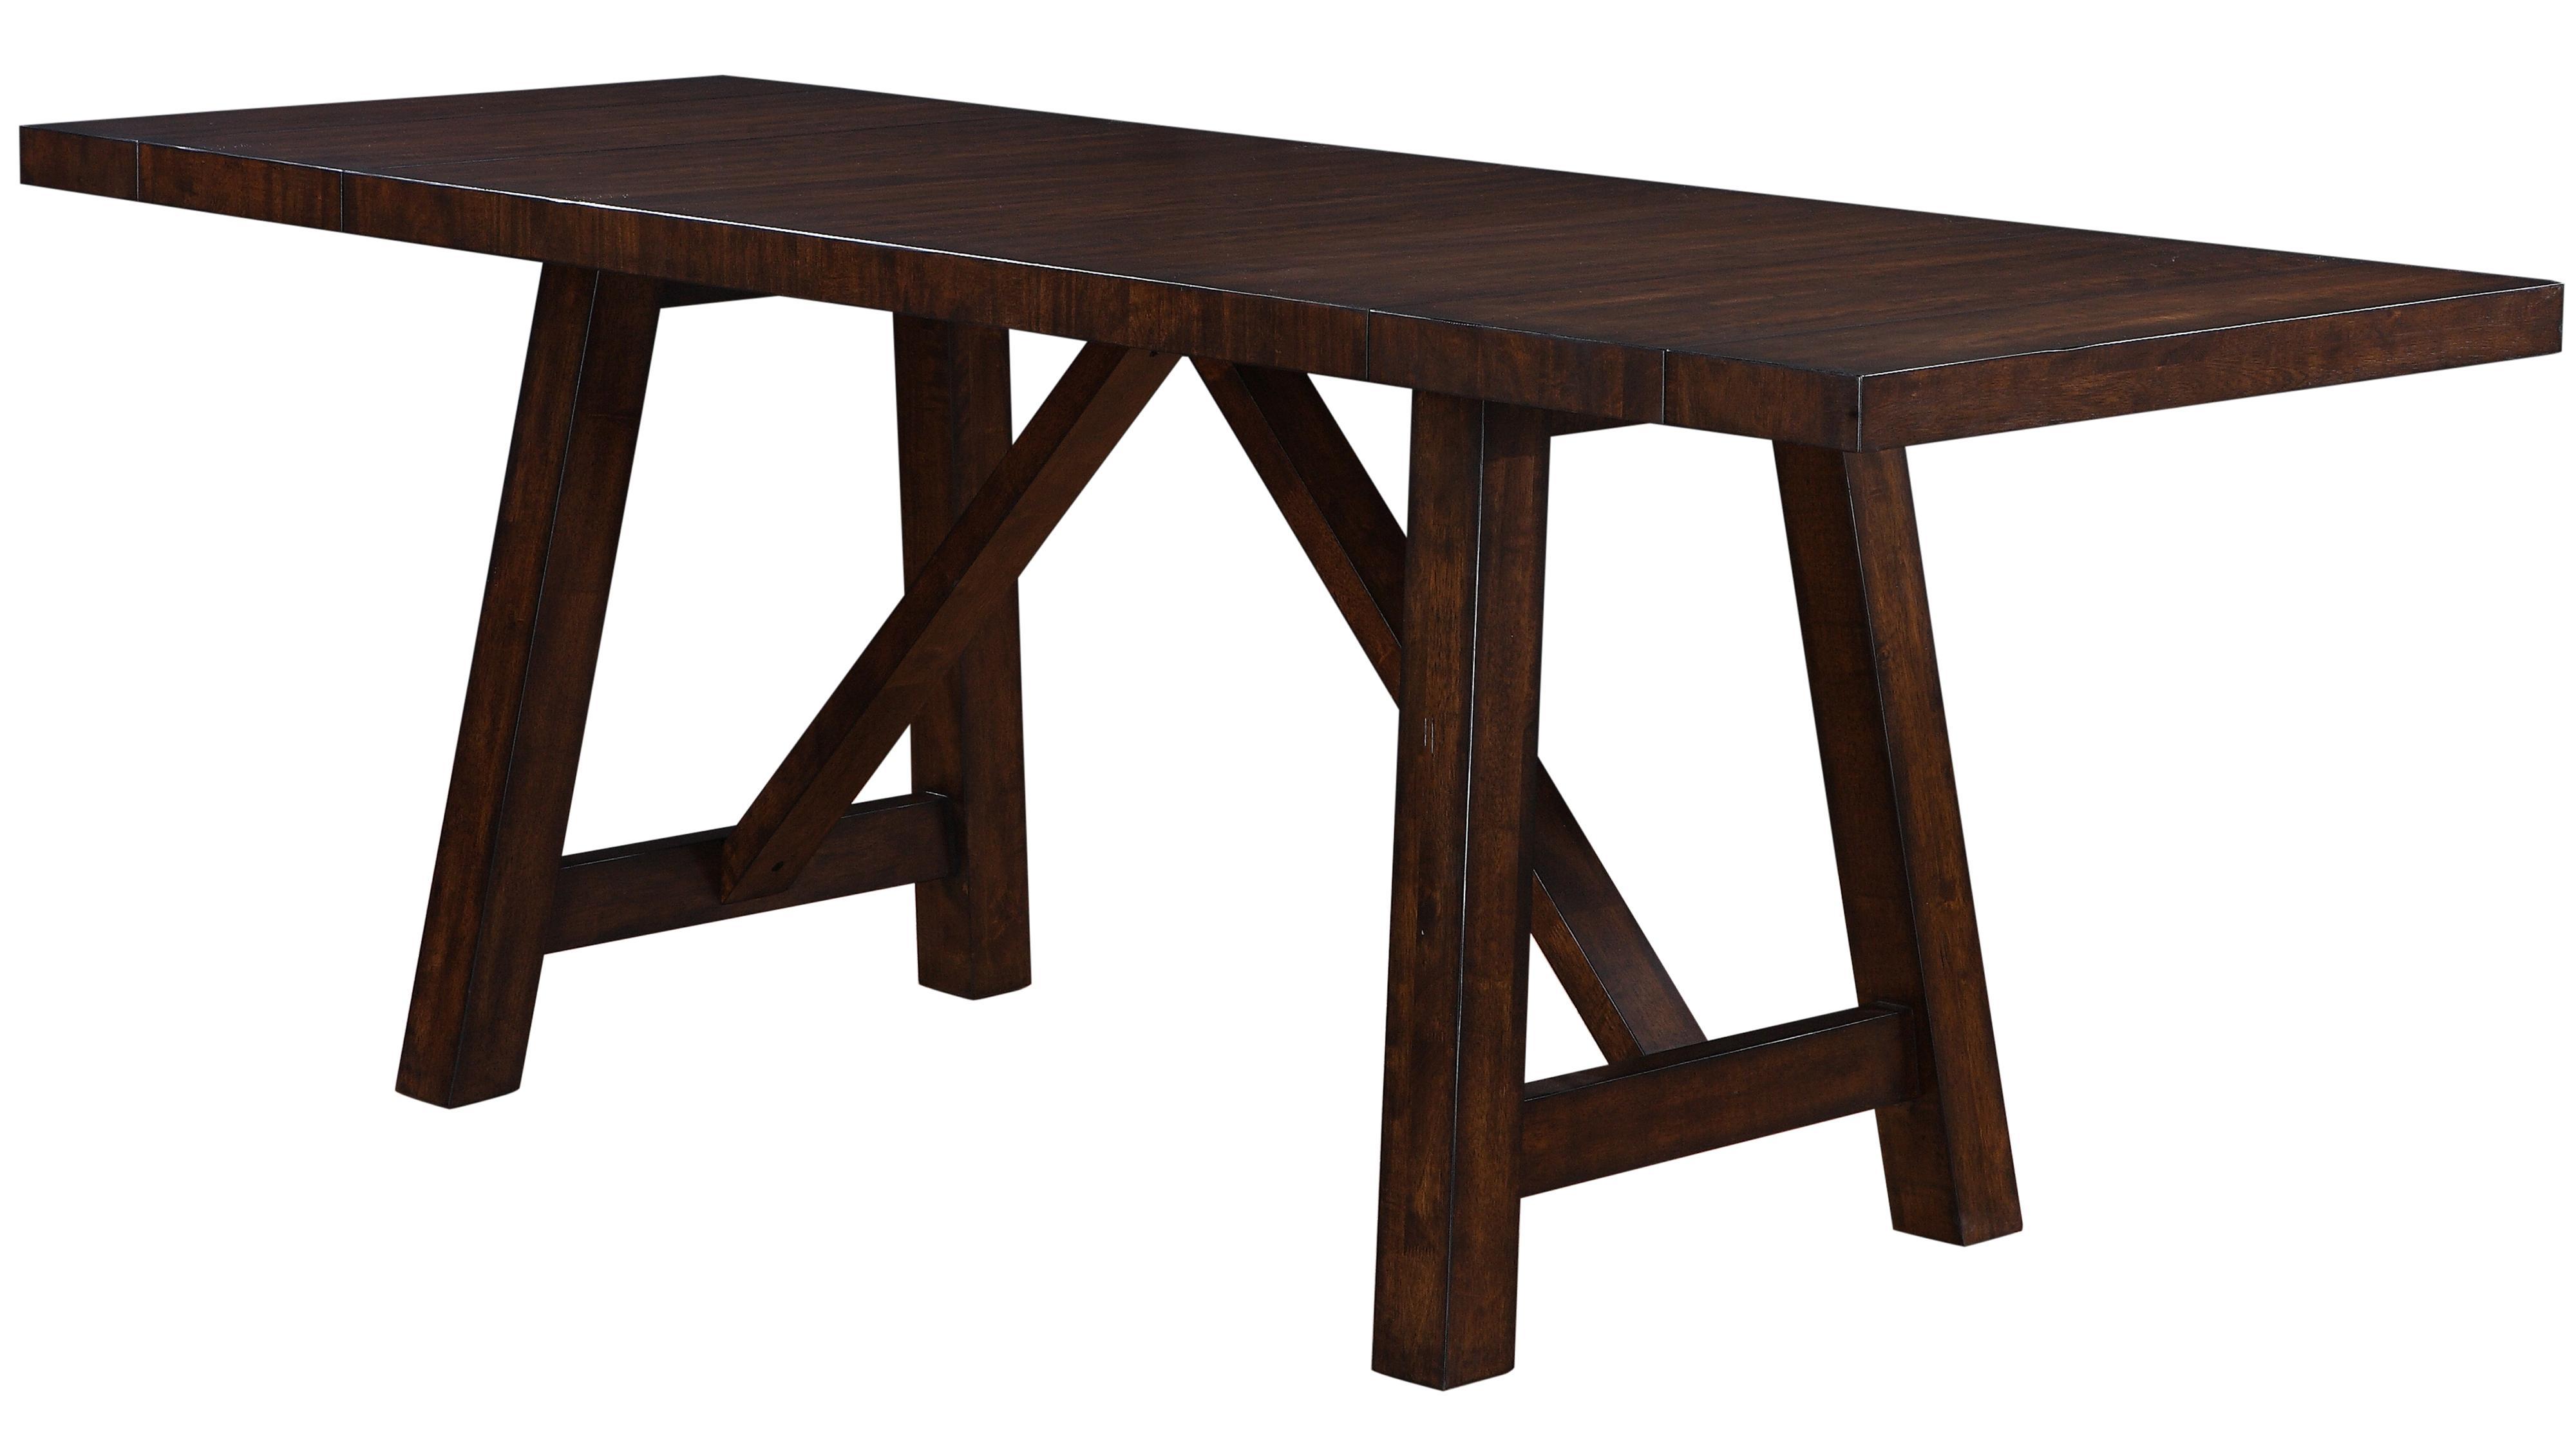 Morris Home Furnishings Norwalk Norwalk Colonial Table - Item Number: 1278-4296L